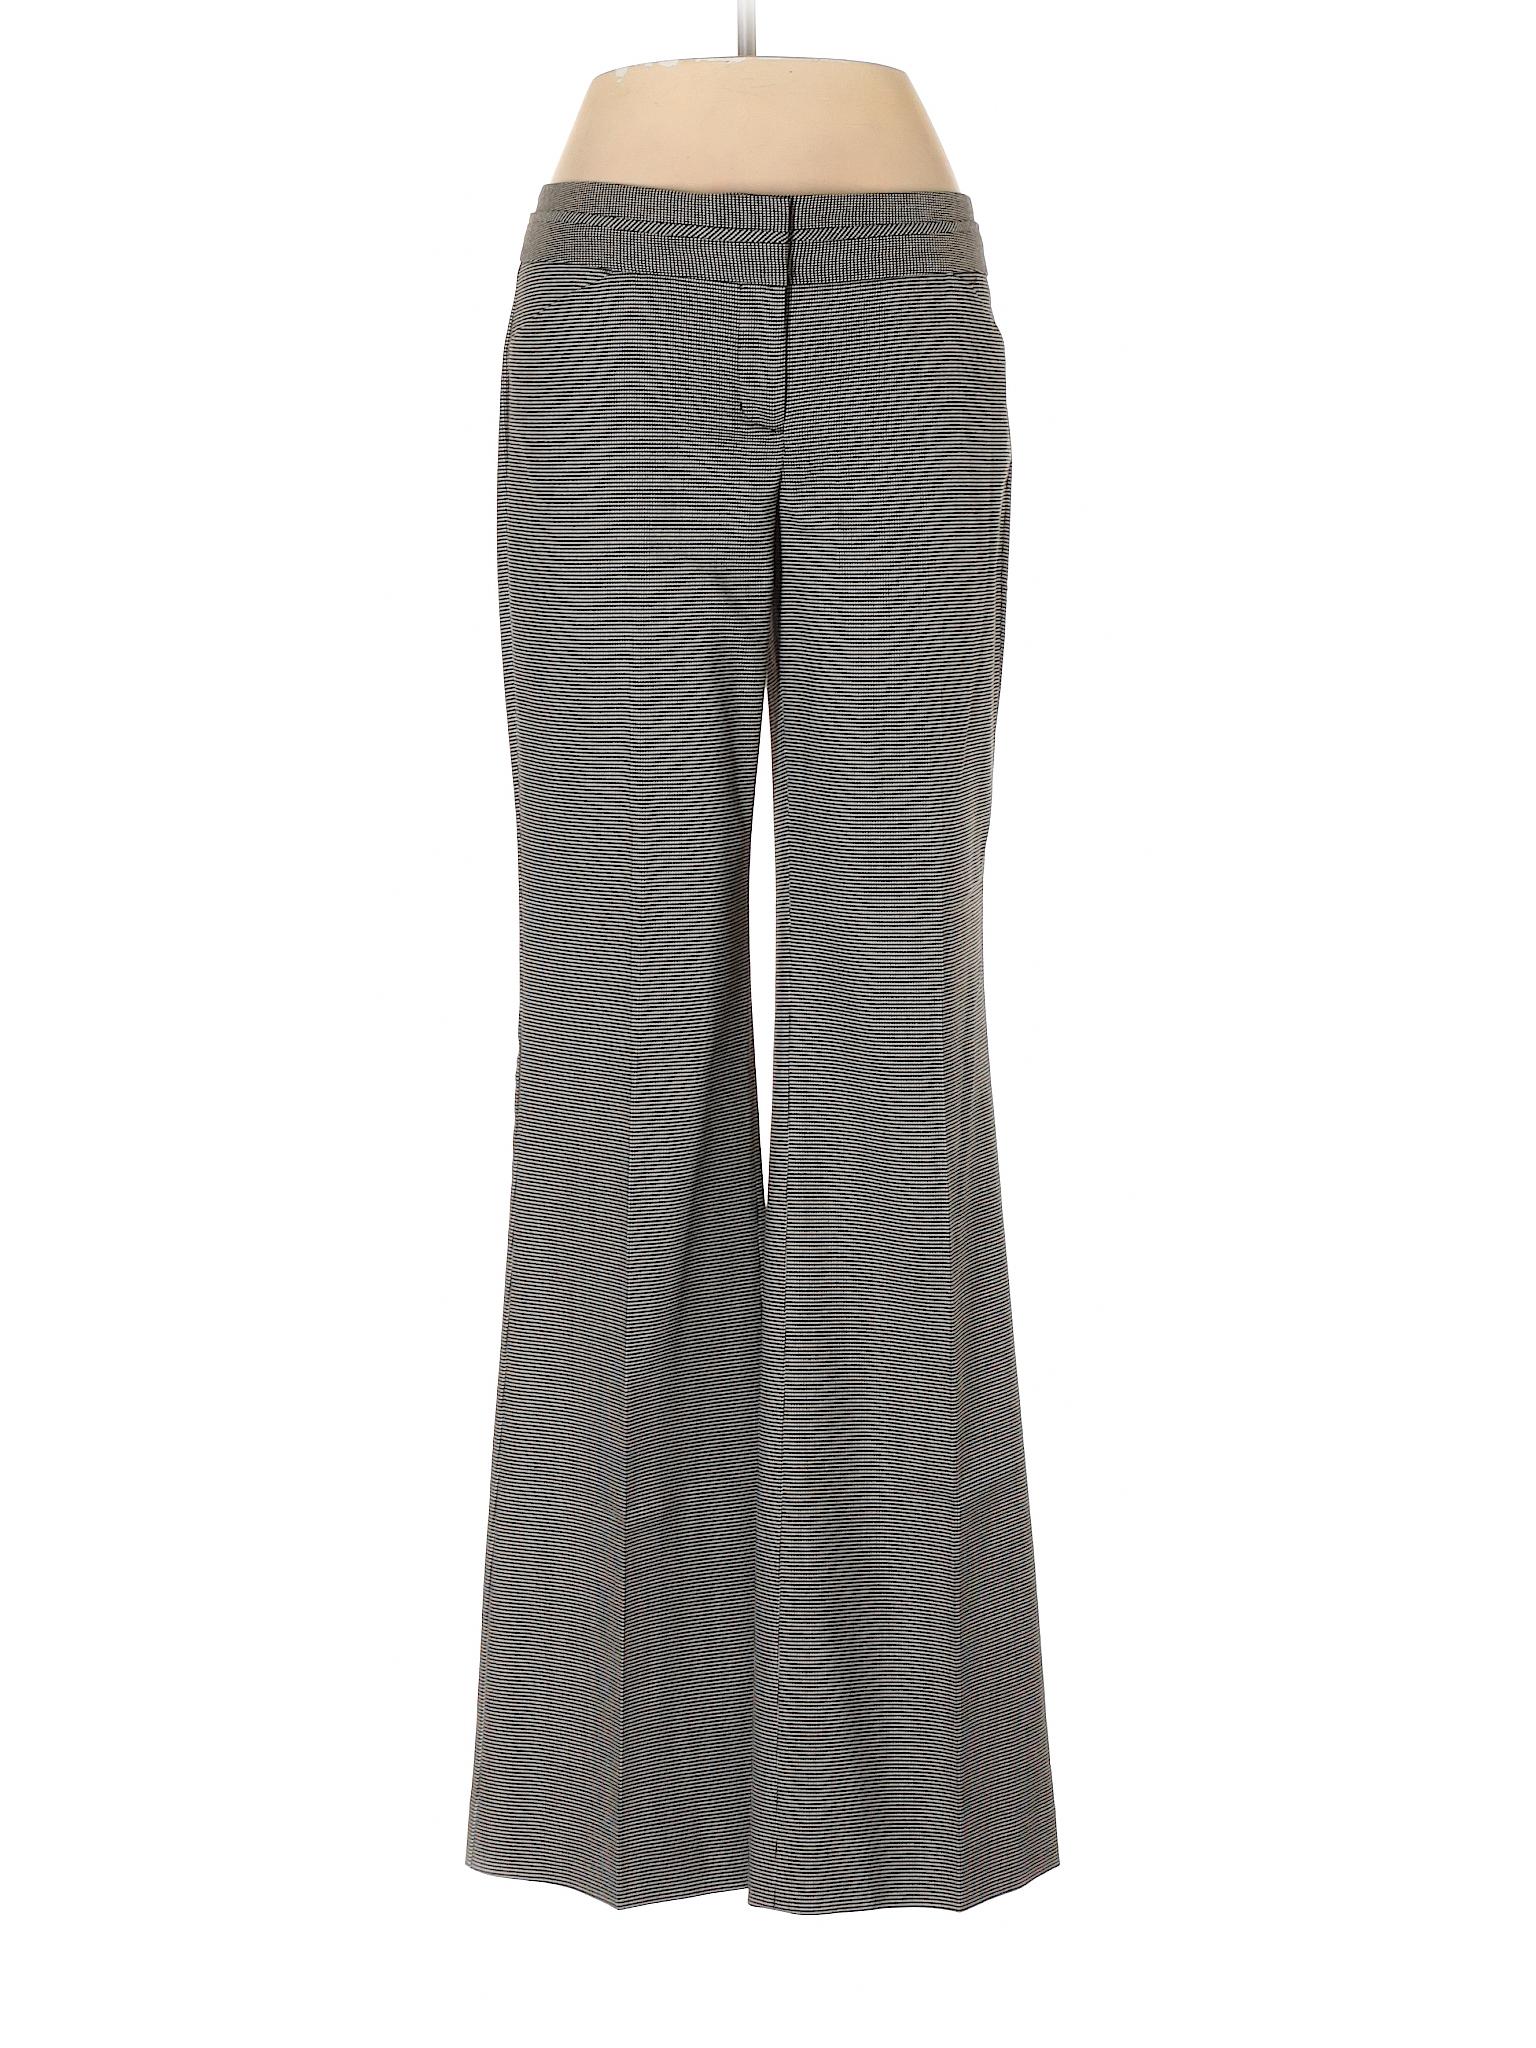 Pants Design Express Dress Studio Boutique nCYFaqwW